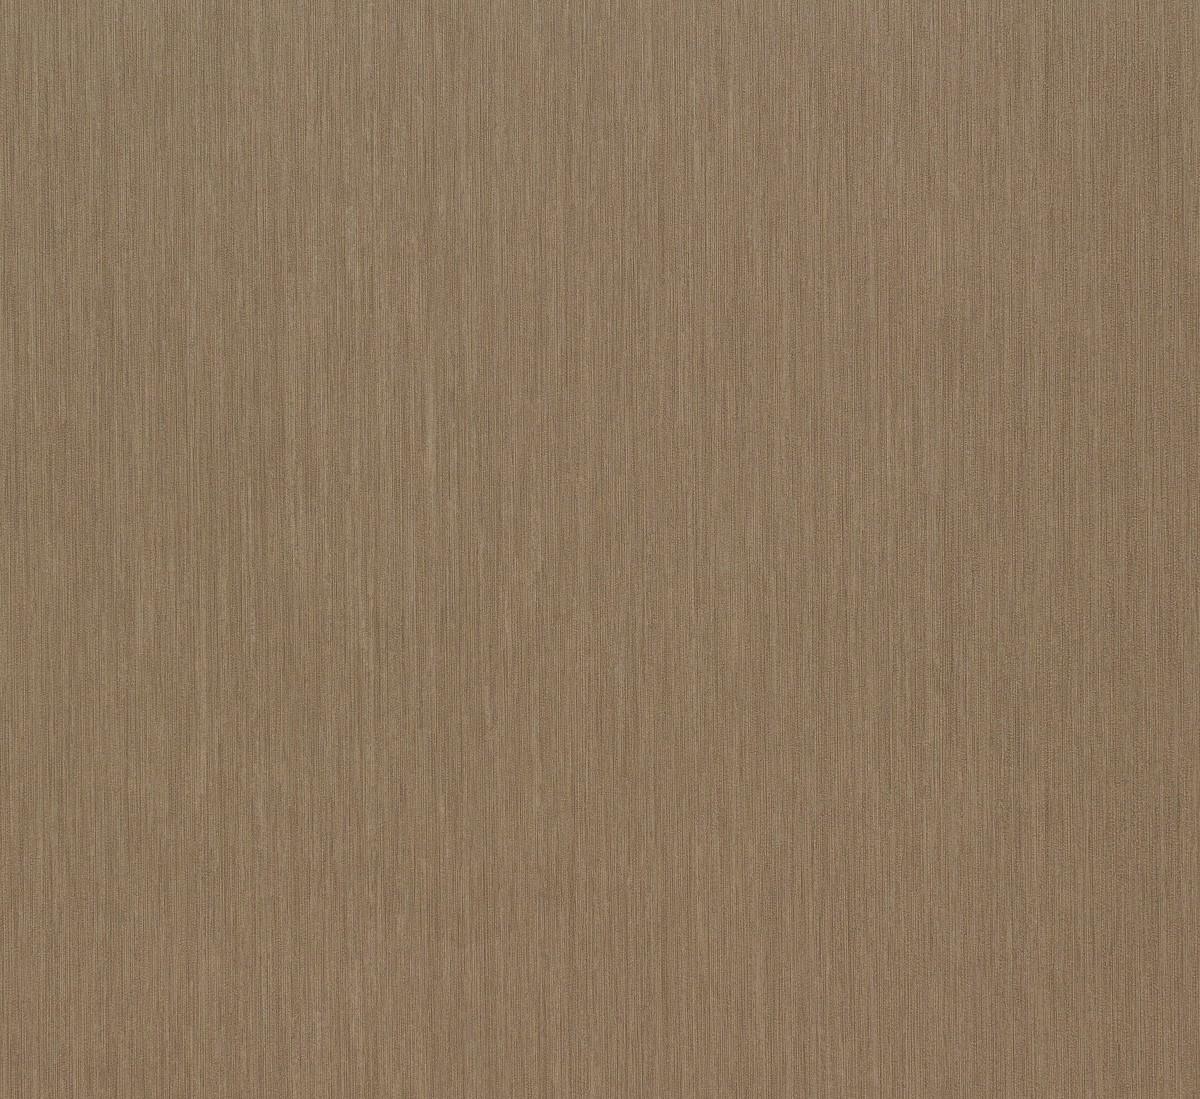 Bistrogardine Streifen Calypso halbtransparent braun 183943